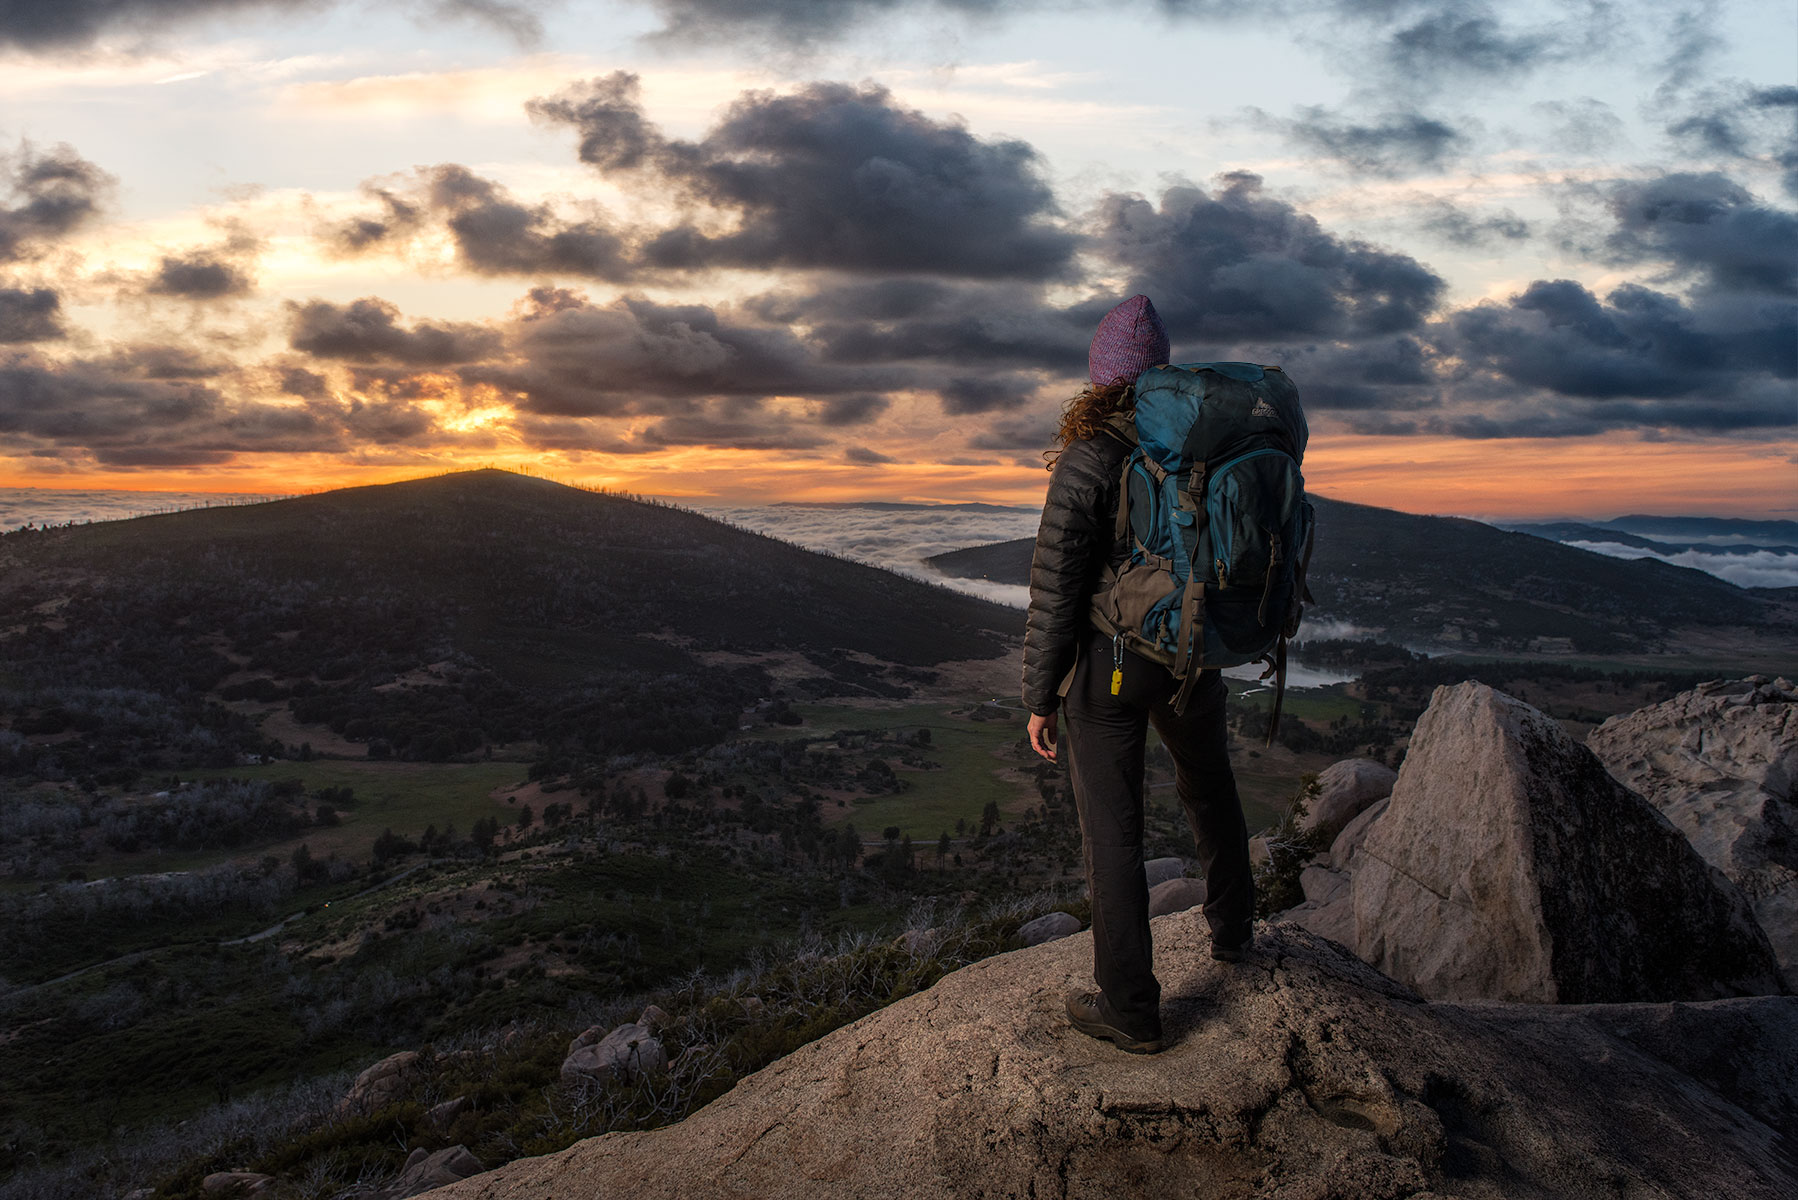 austin-trigg-southern-california-hike-StoneWall-Peak-Cuymaca-san-diego-sunset-adventure.jpg